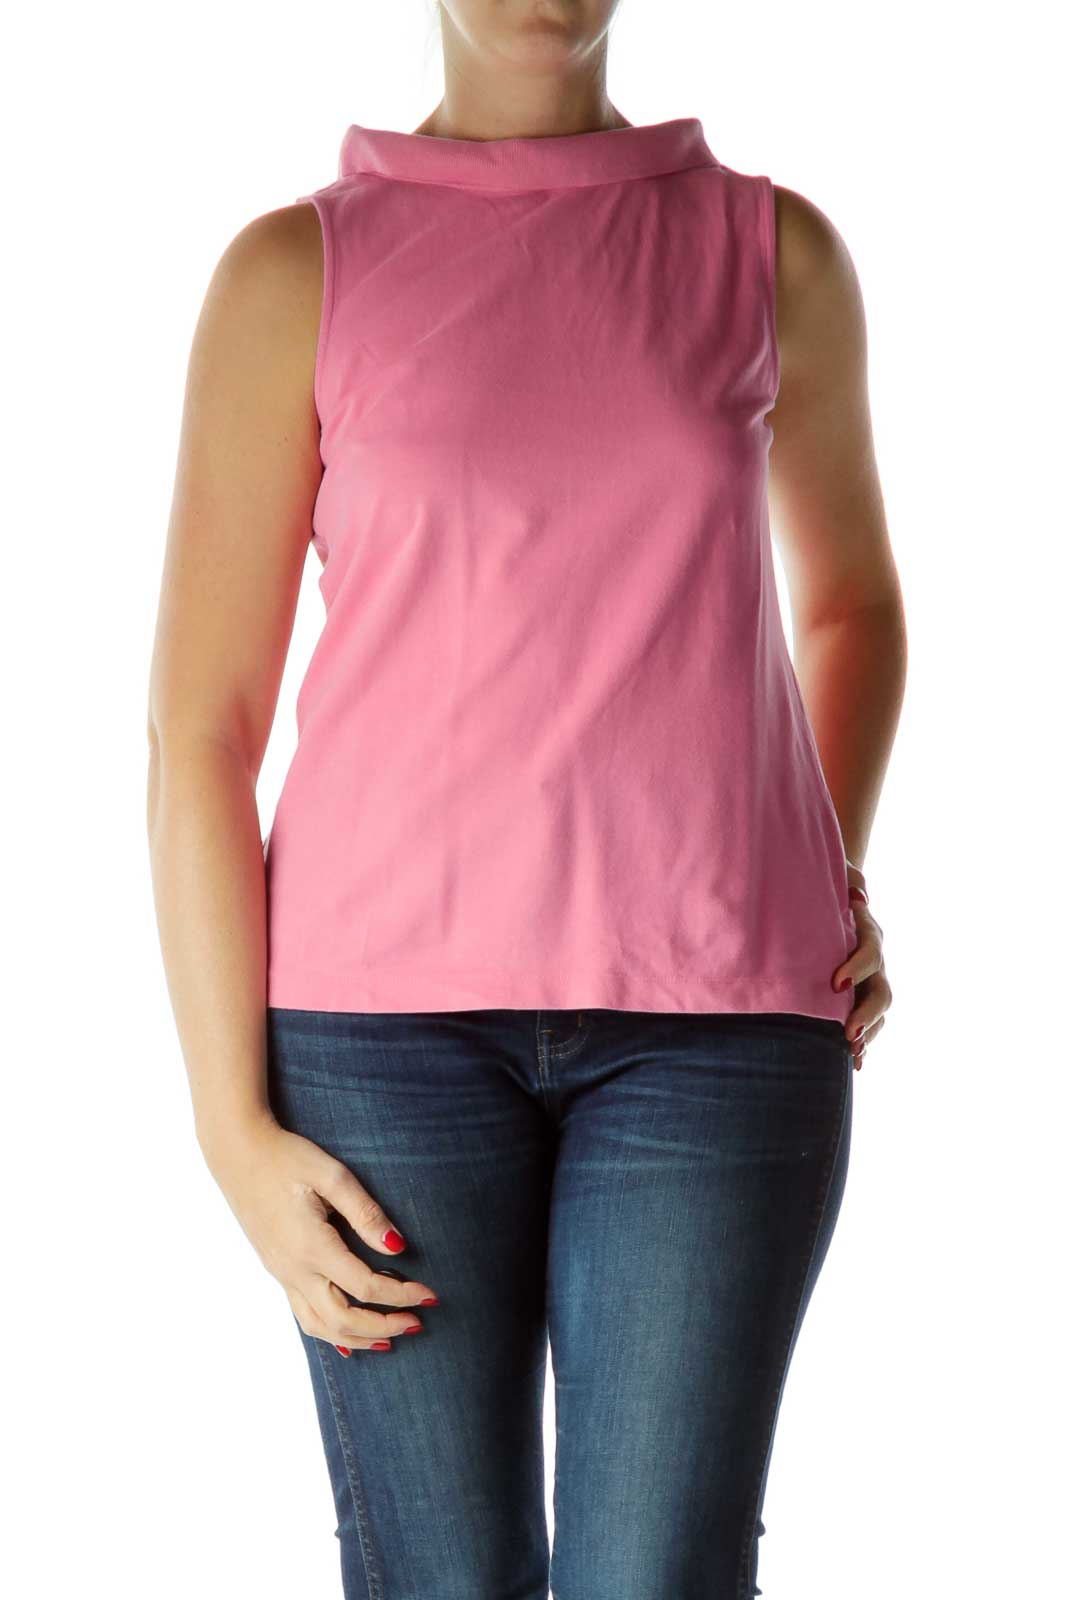 Pink Collared Sleeveless Jersey-Knit Shirt